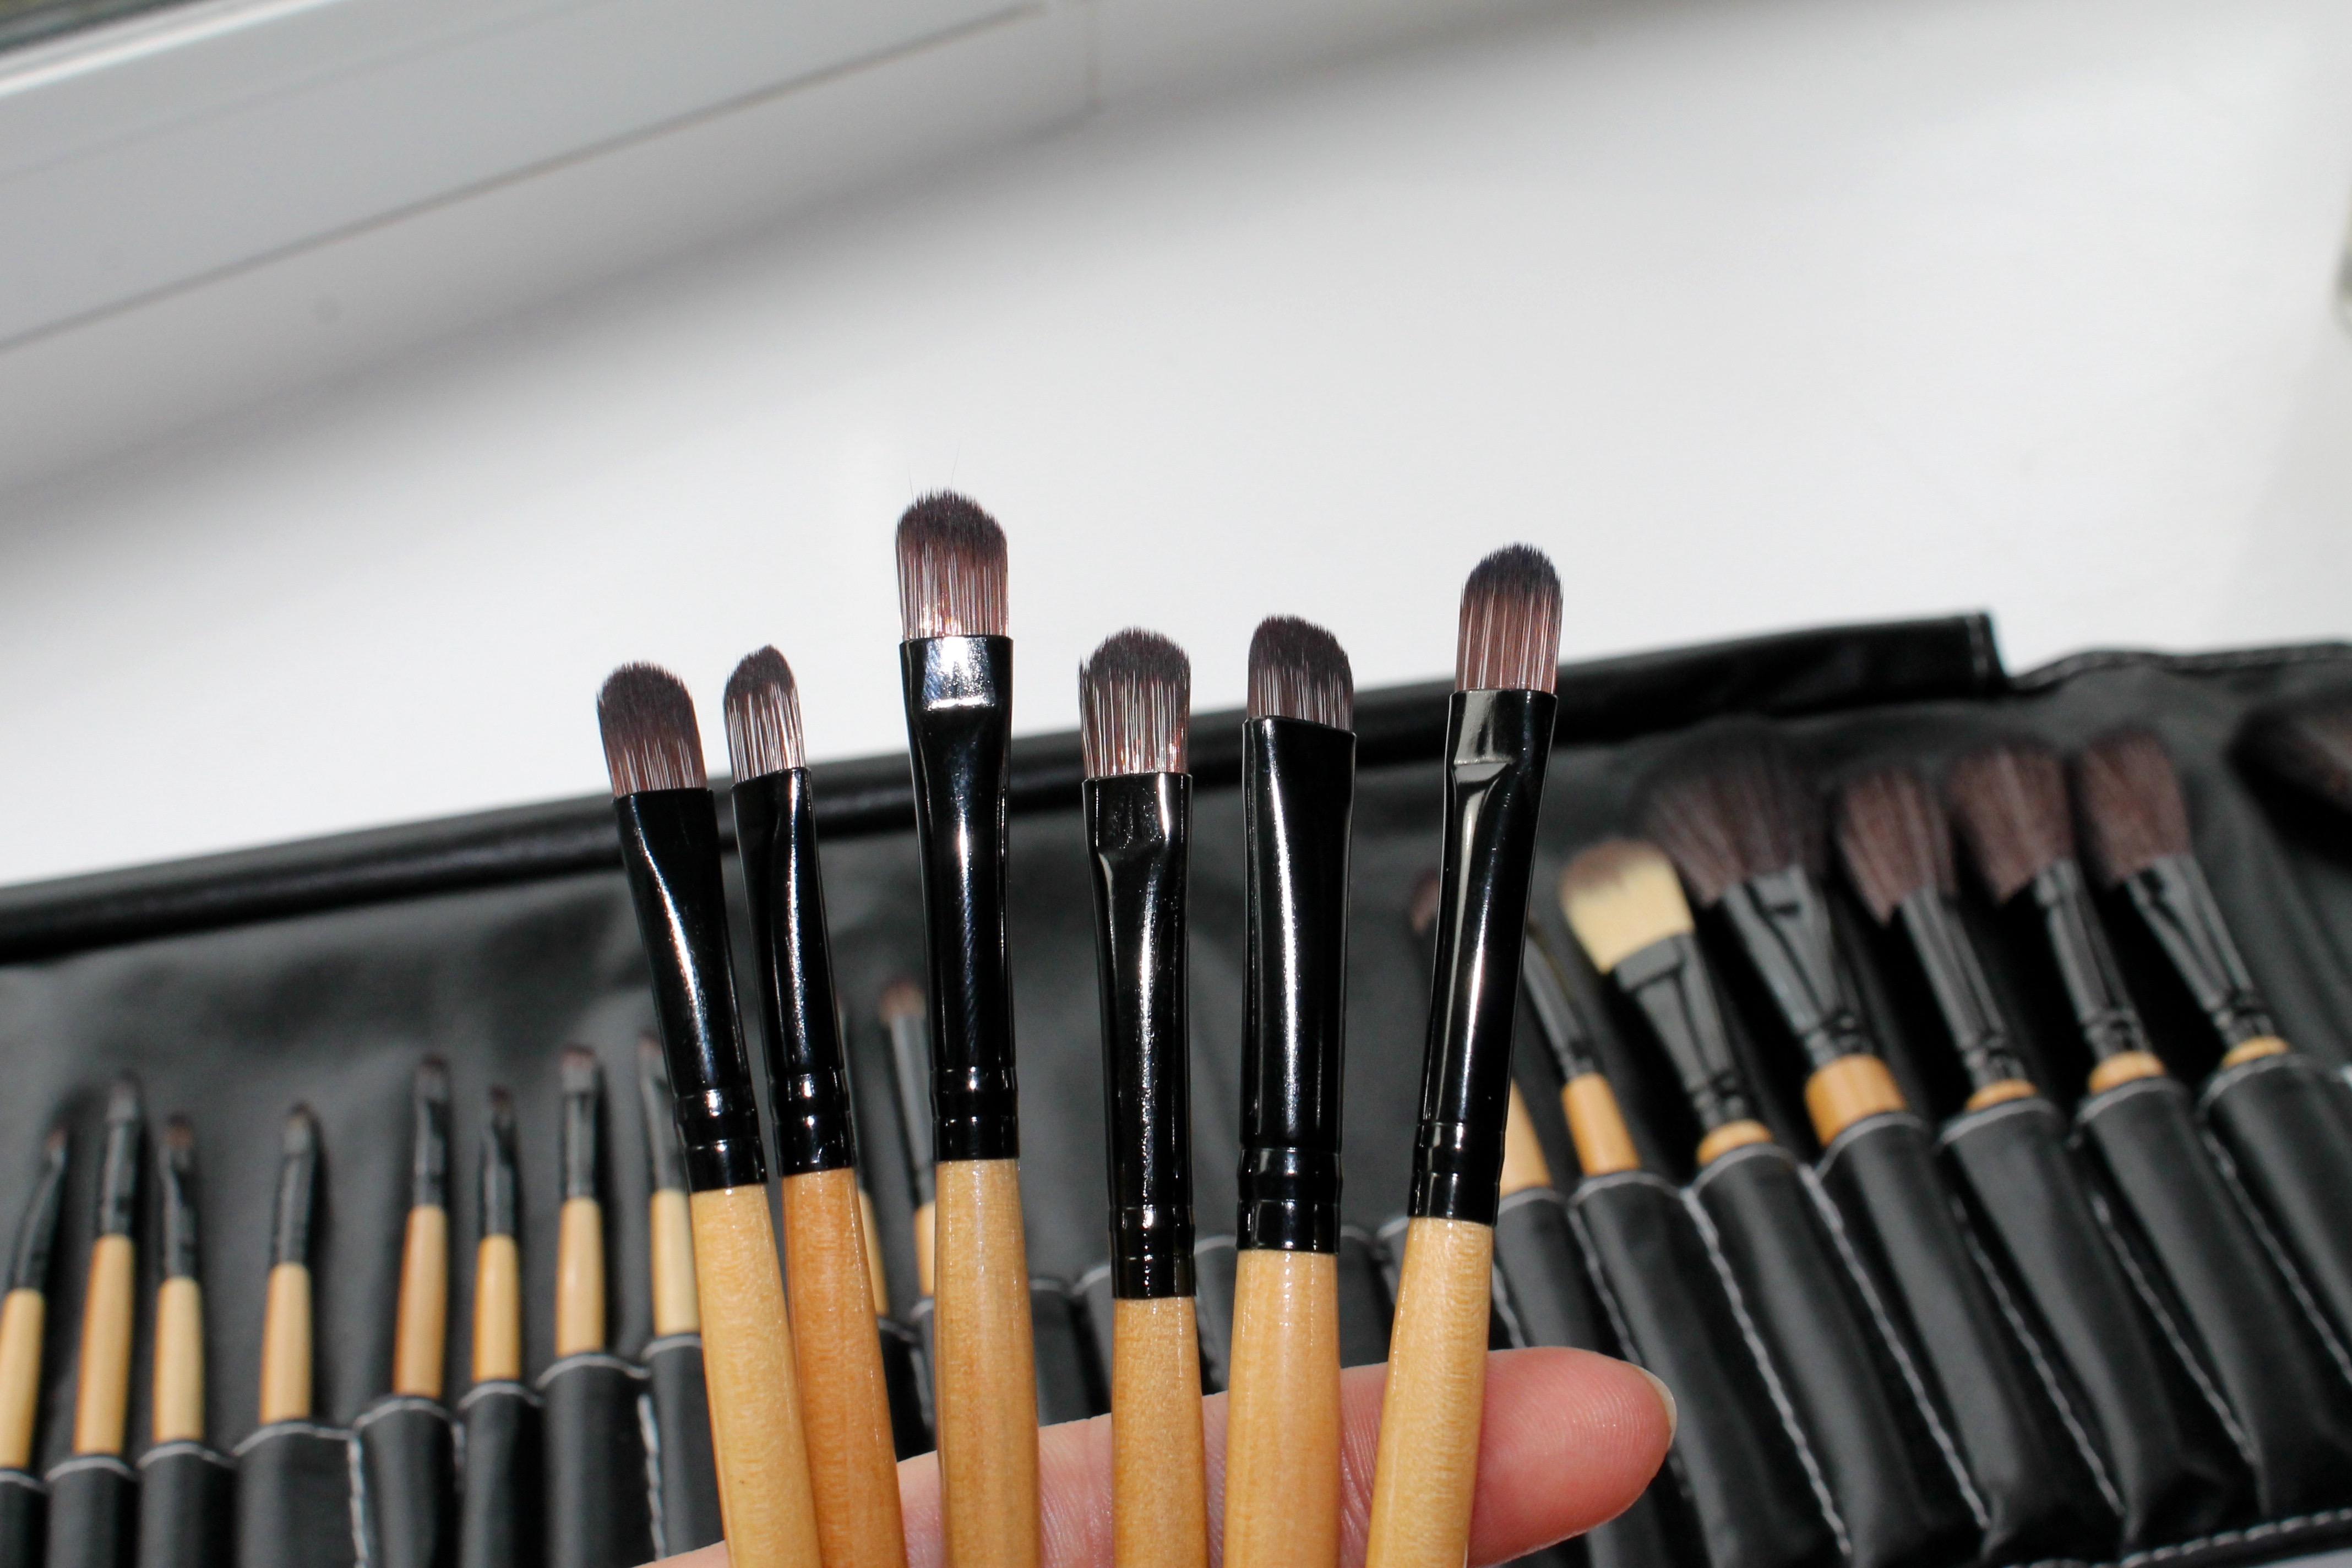 Джаст кисти для макияжа